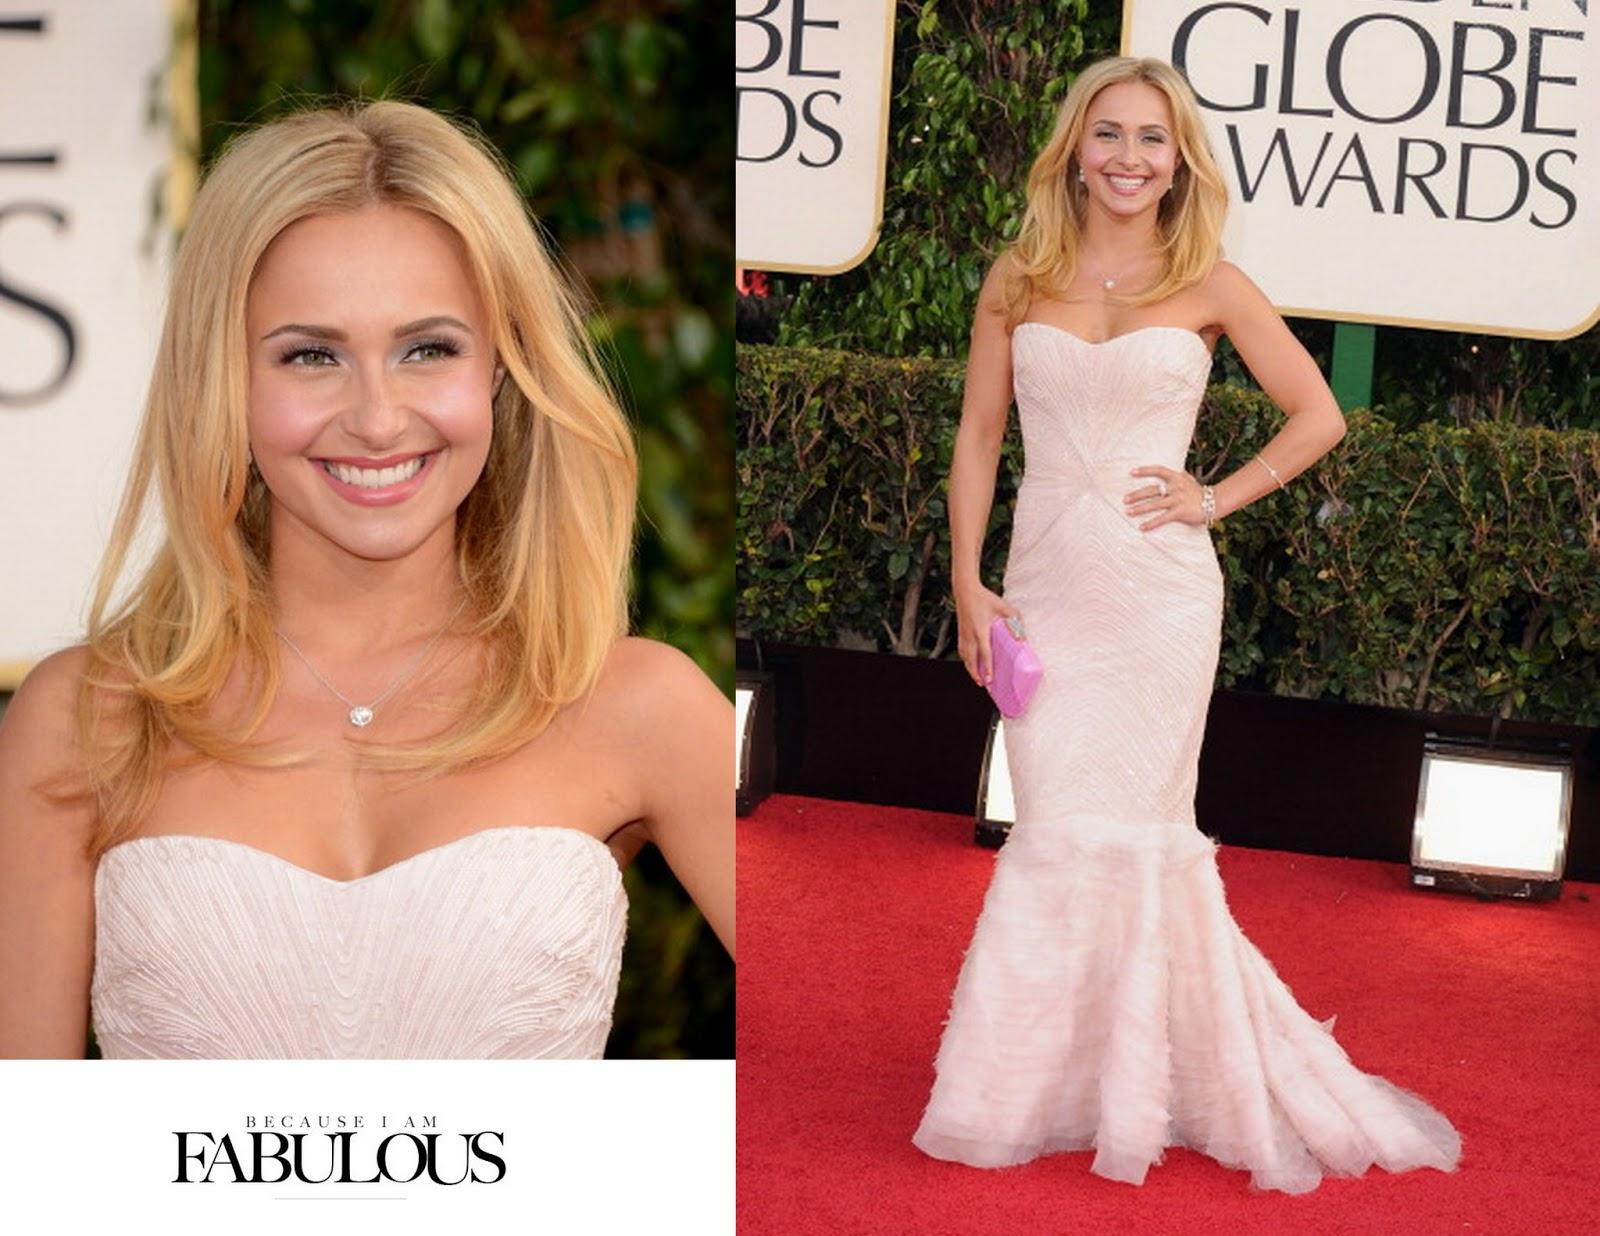 http://2.bp.blogspot.com/-QJVJVPAENyg/UUF7WhDtf2I/AAAAAAAAEww/sU16HZIVQrg/s1600/Wikimise-Hayden-Panettiere-Dress-pink-2013-Golden-Globe-Awards-Roberto-Cavalli-gorgeous.jpg